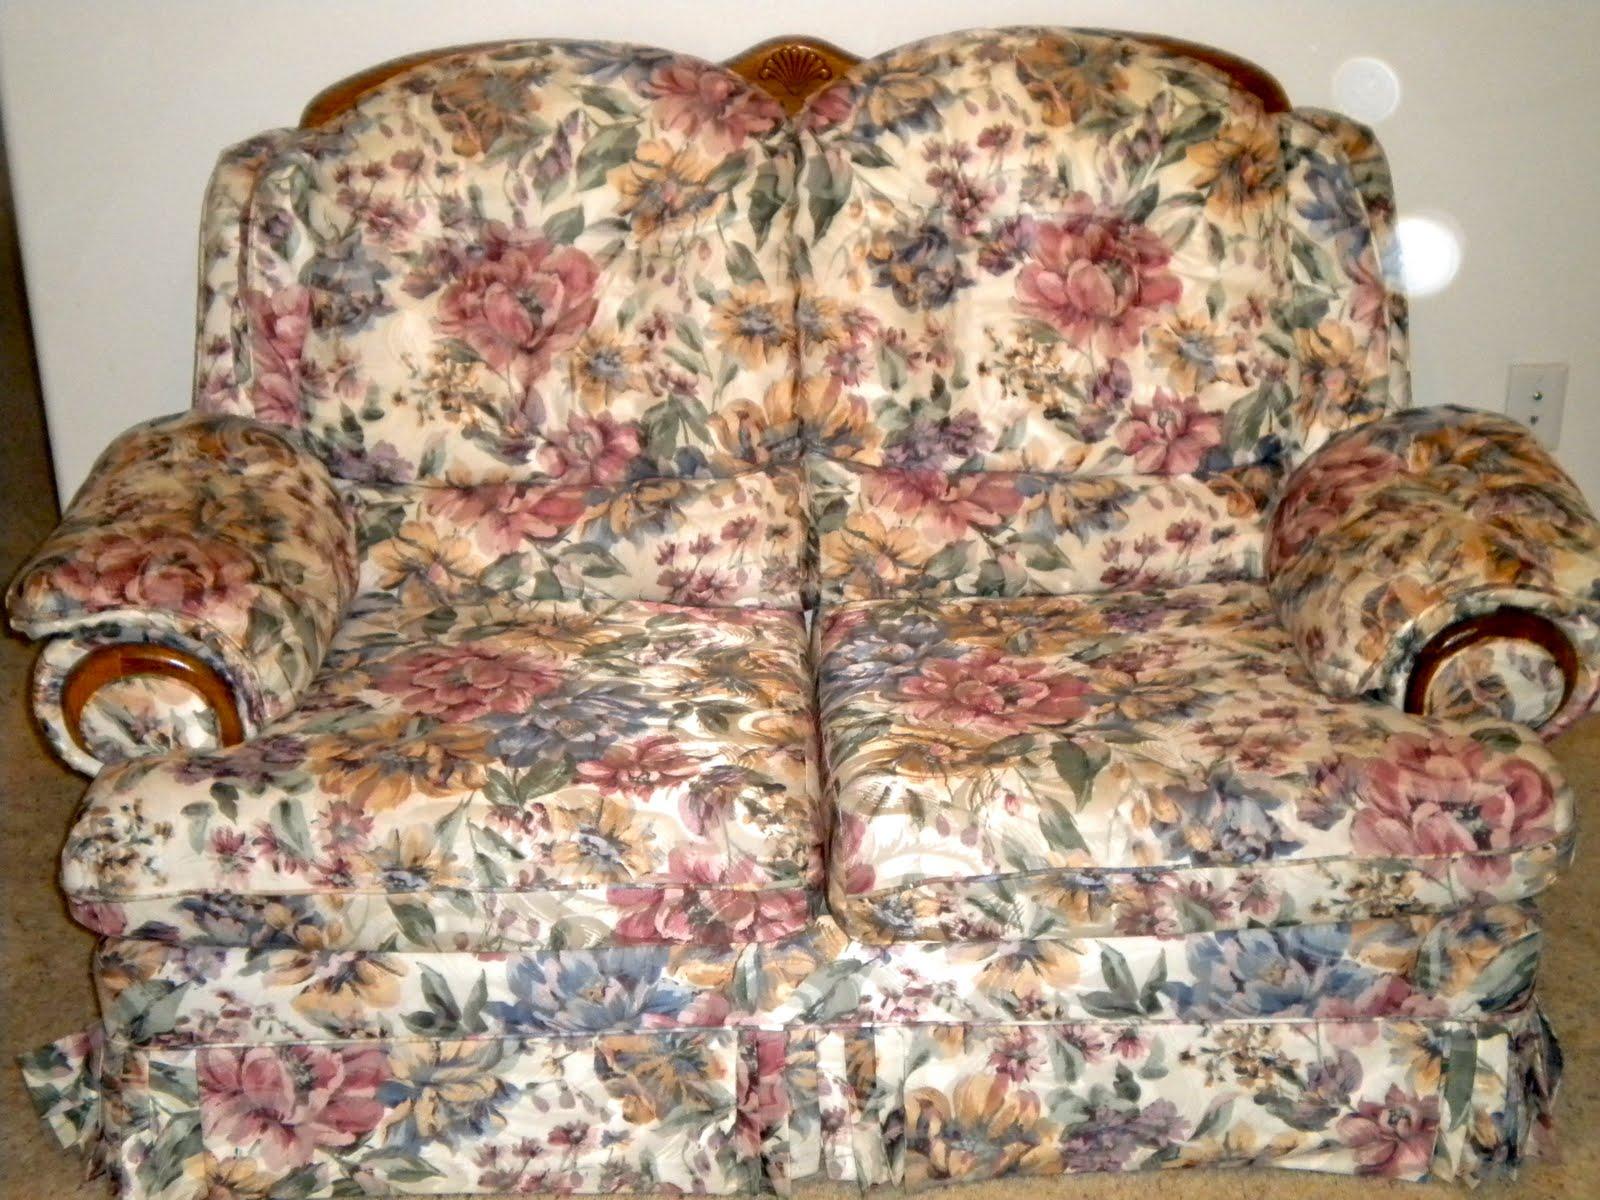 ay studded sofa - Home The Honoroak